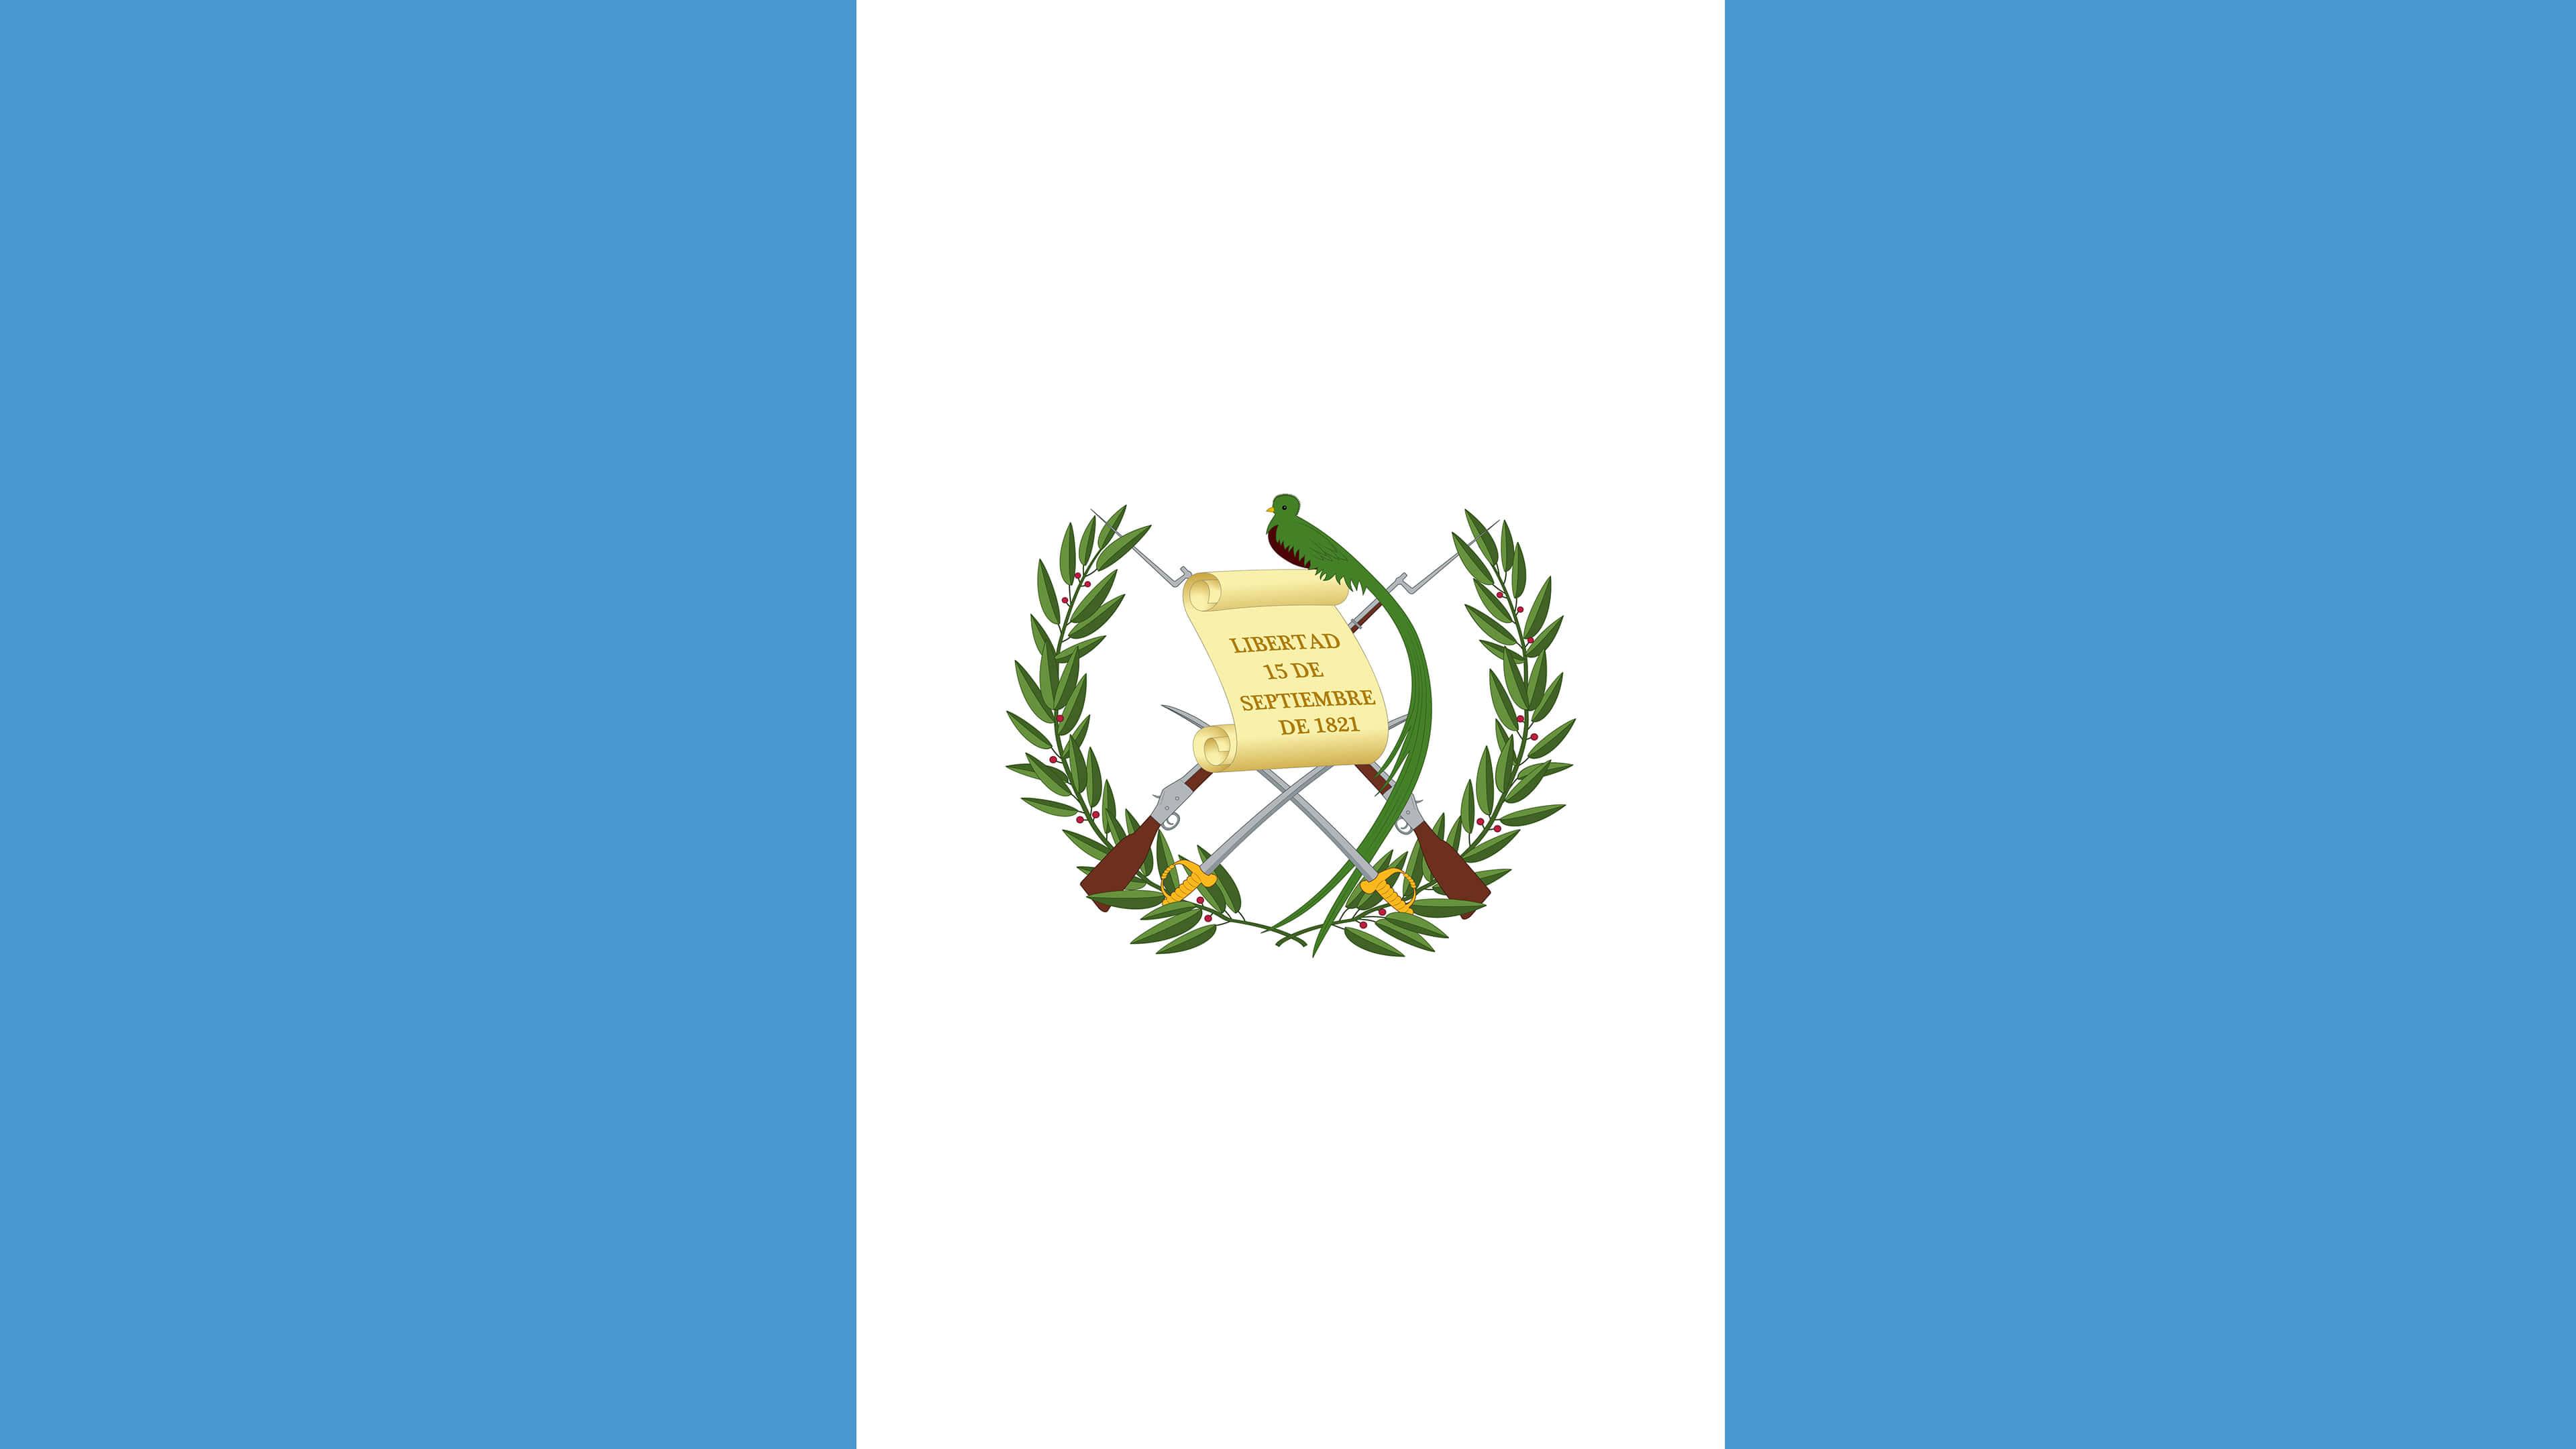 guatemala flag uhd 4k wallpaper